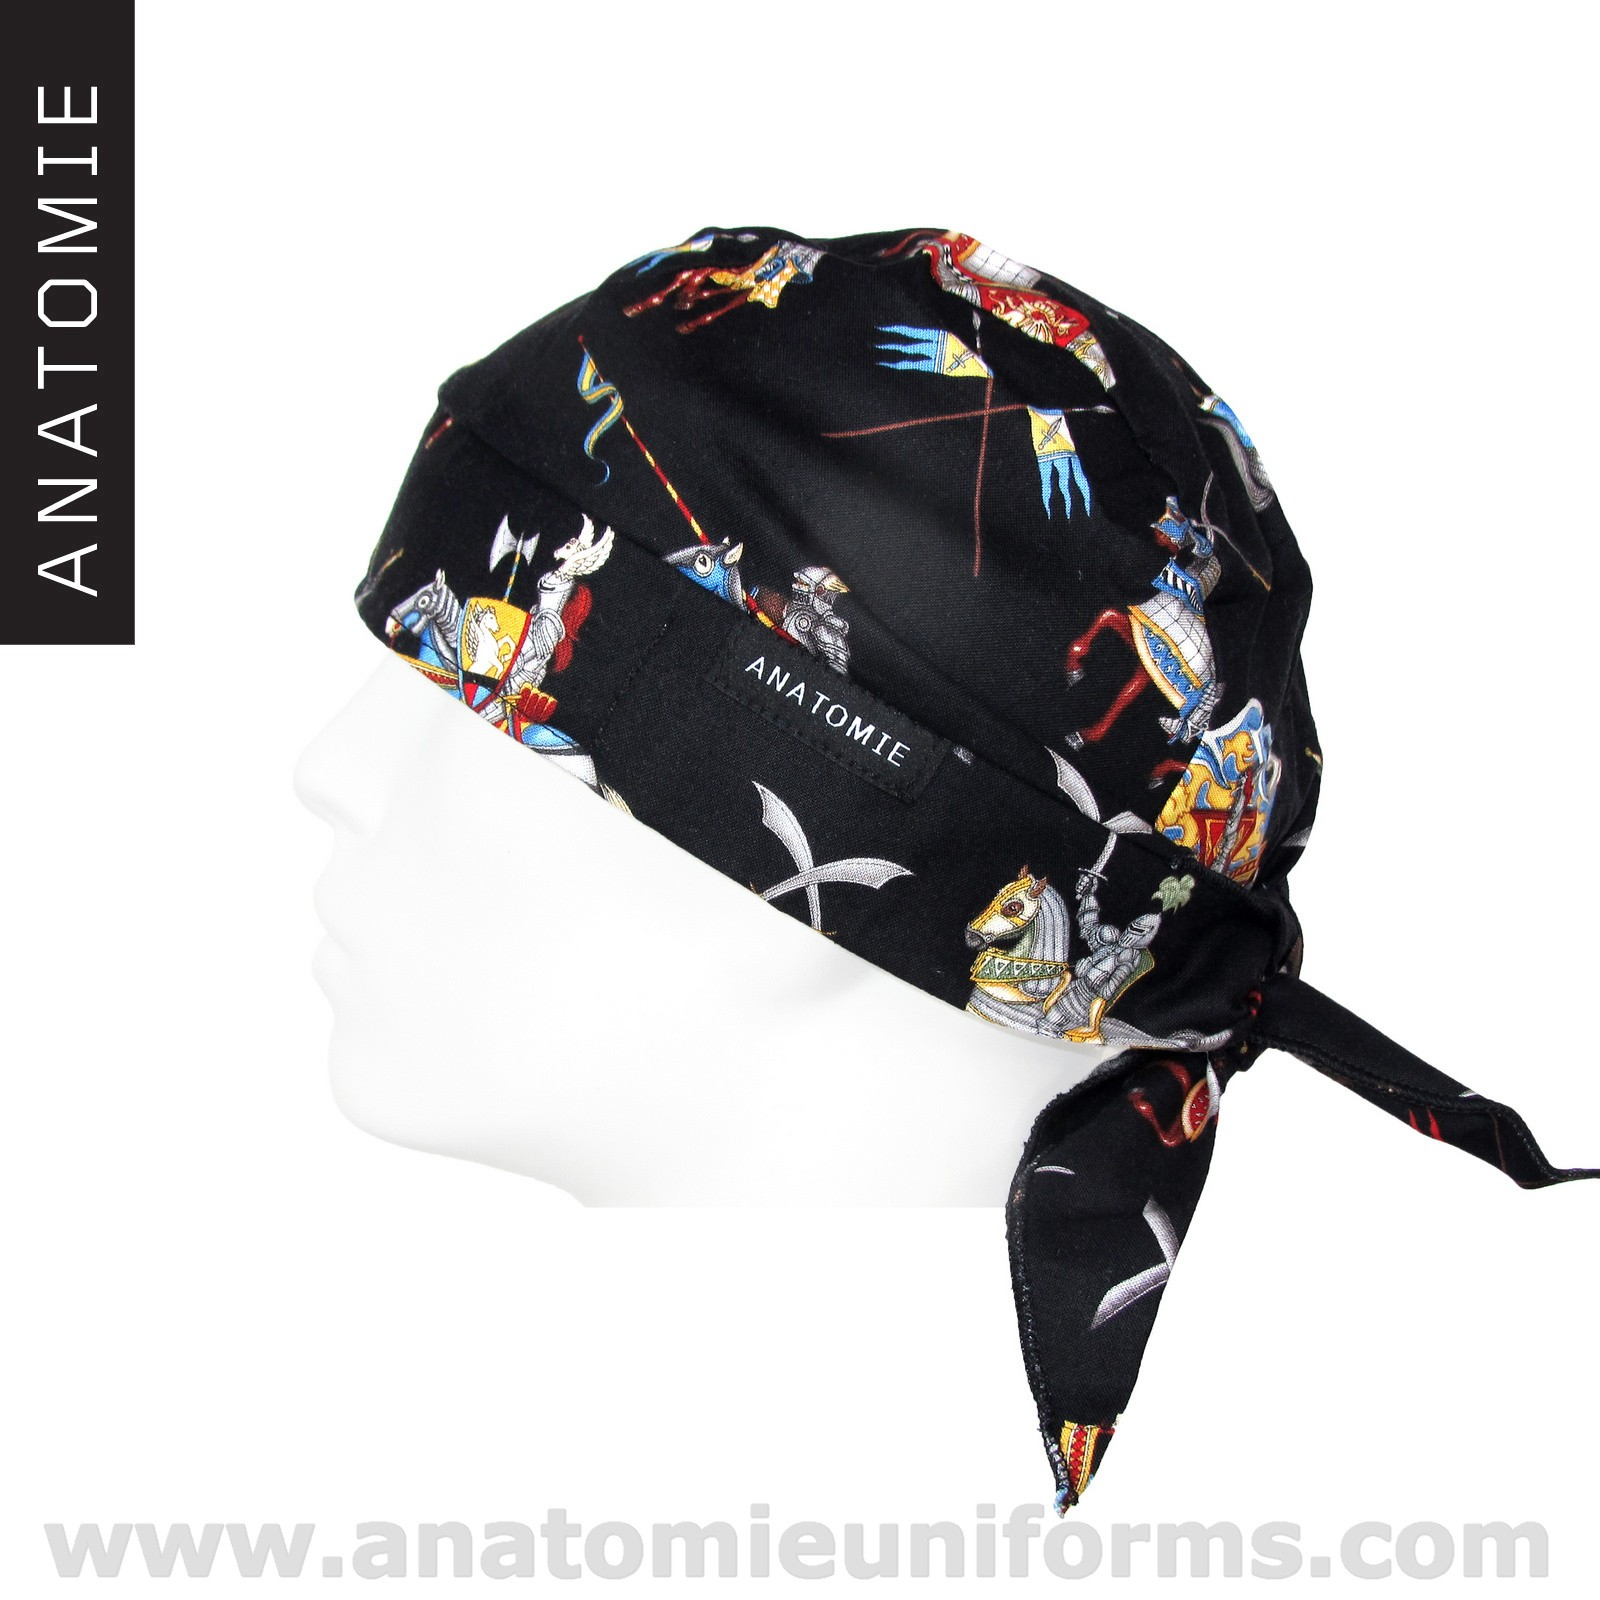 ANATOMIE BANDANA Chevaliers - 013